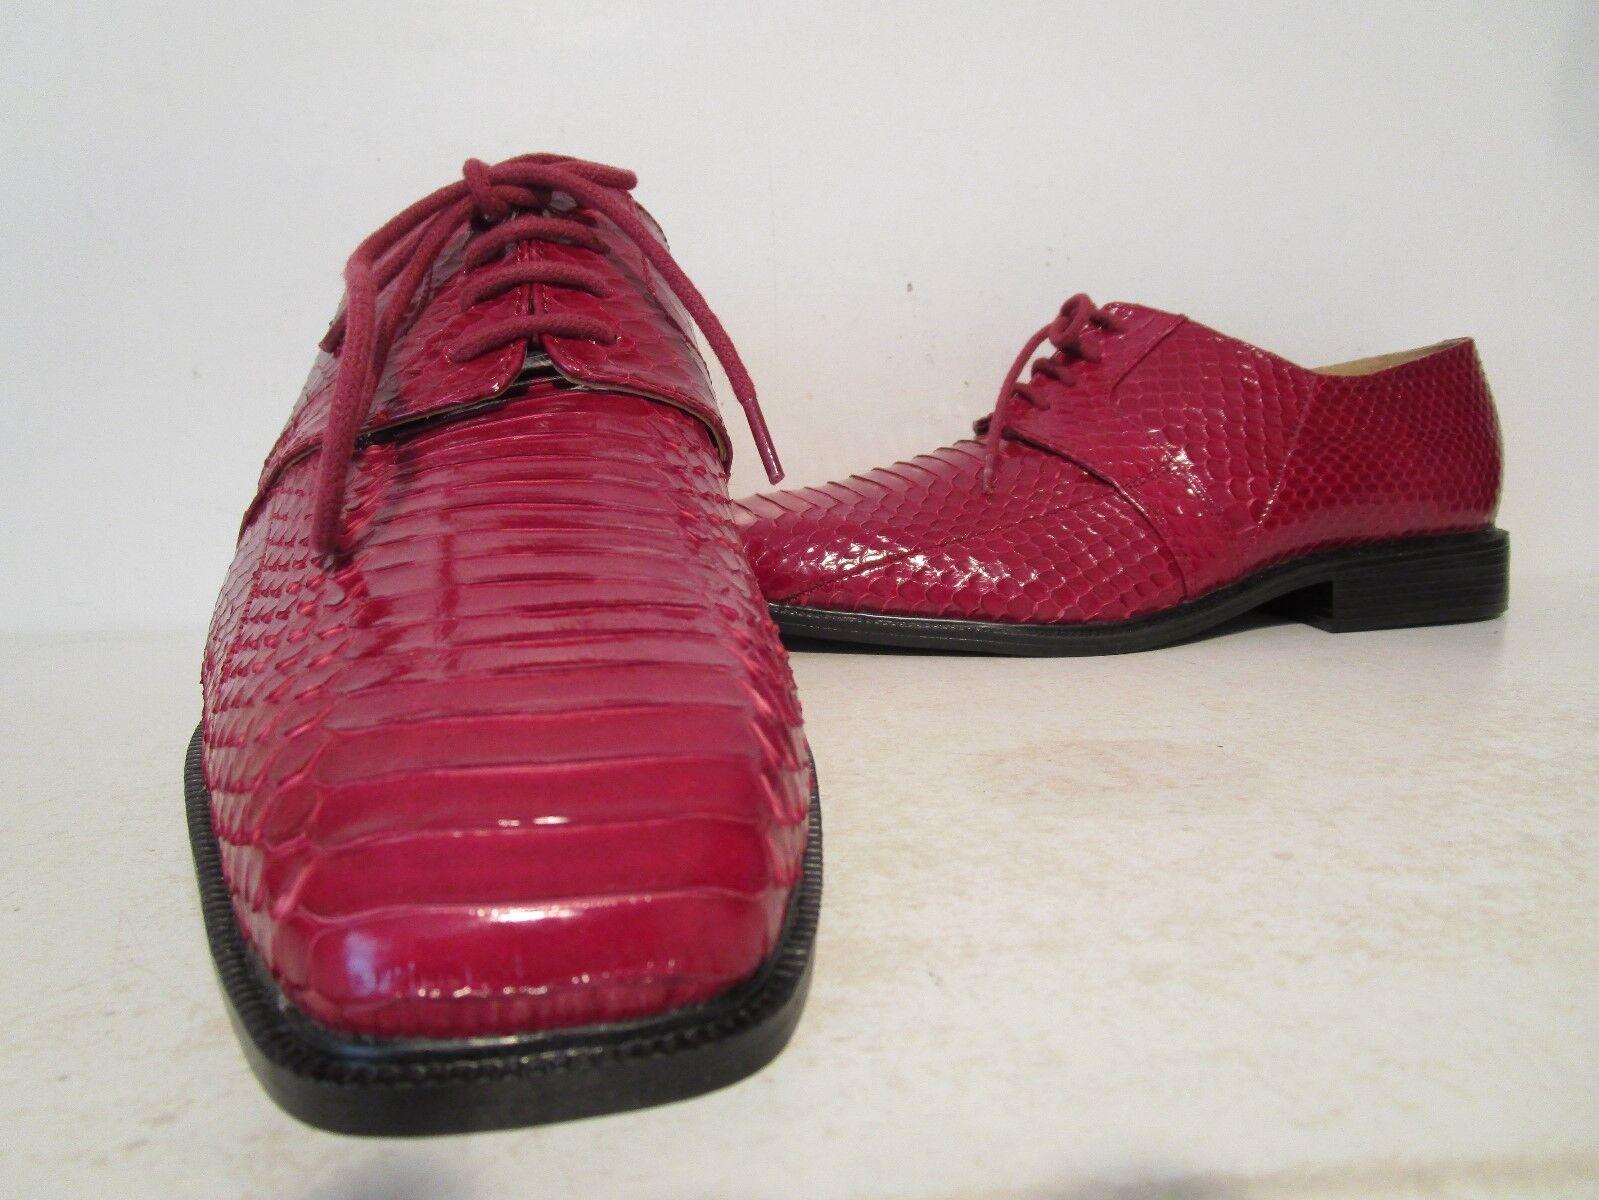 Giorgio Brutini Mens Slaton 15522 Genuine Snakeskin Oxford shoes Red Size 8 12 M